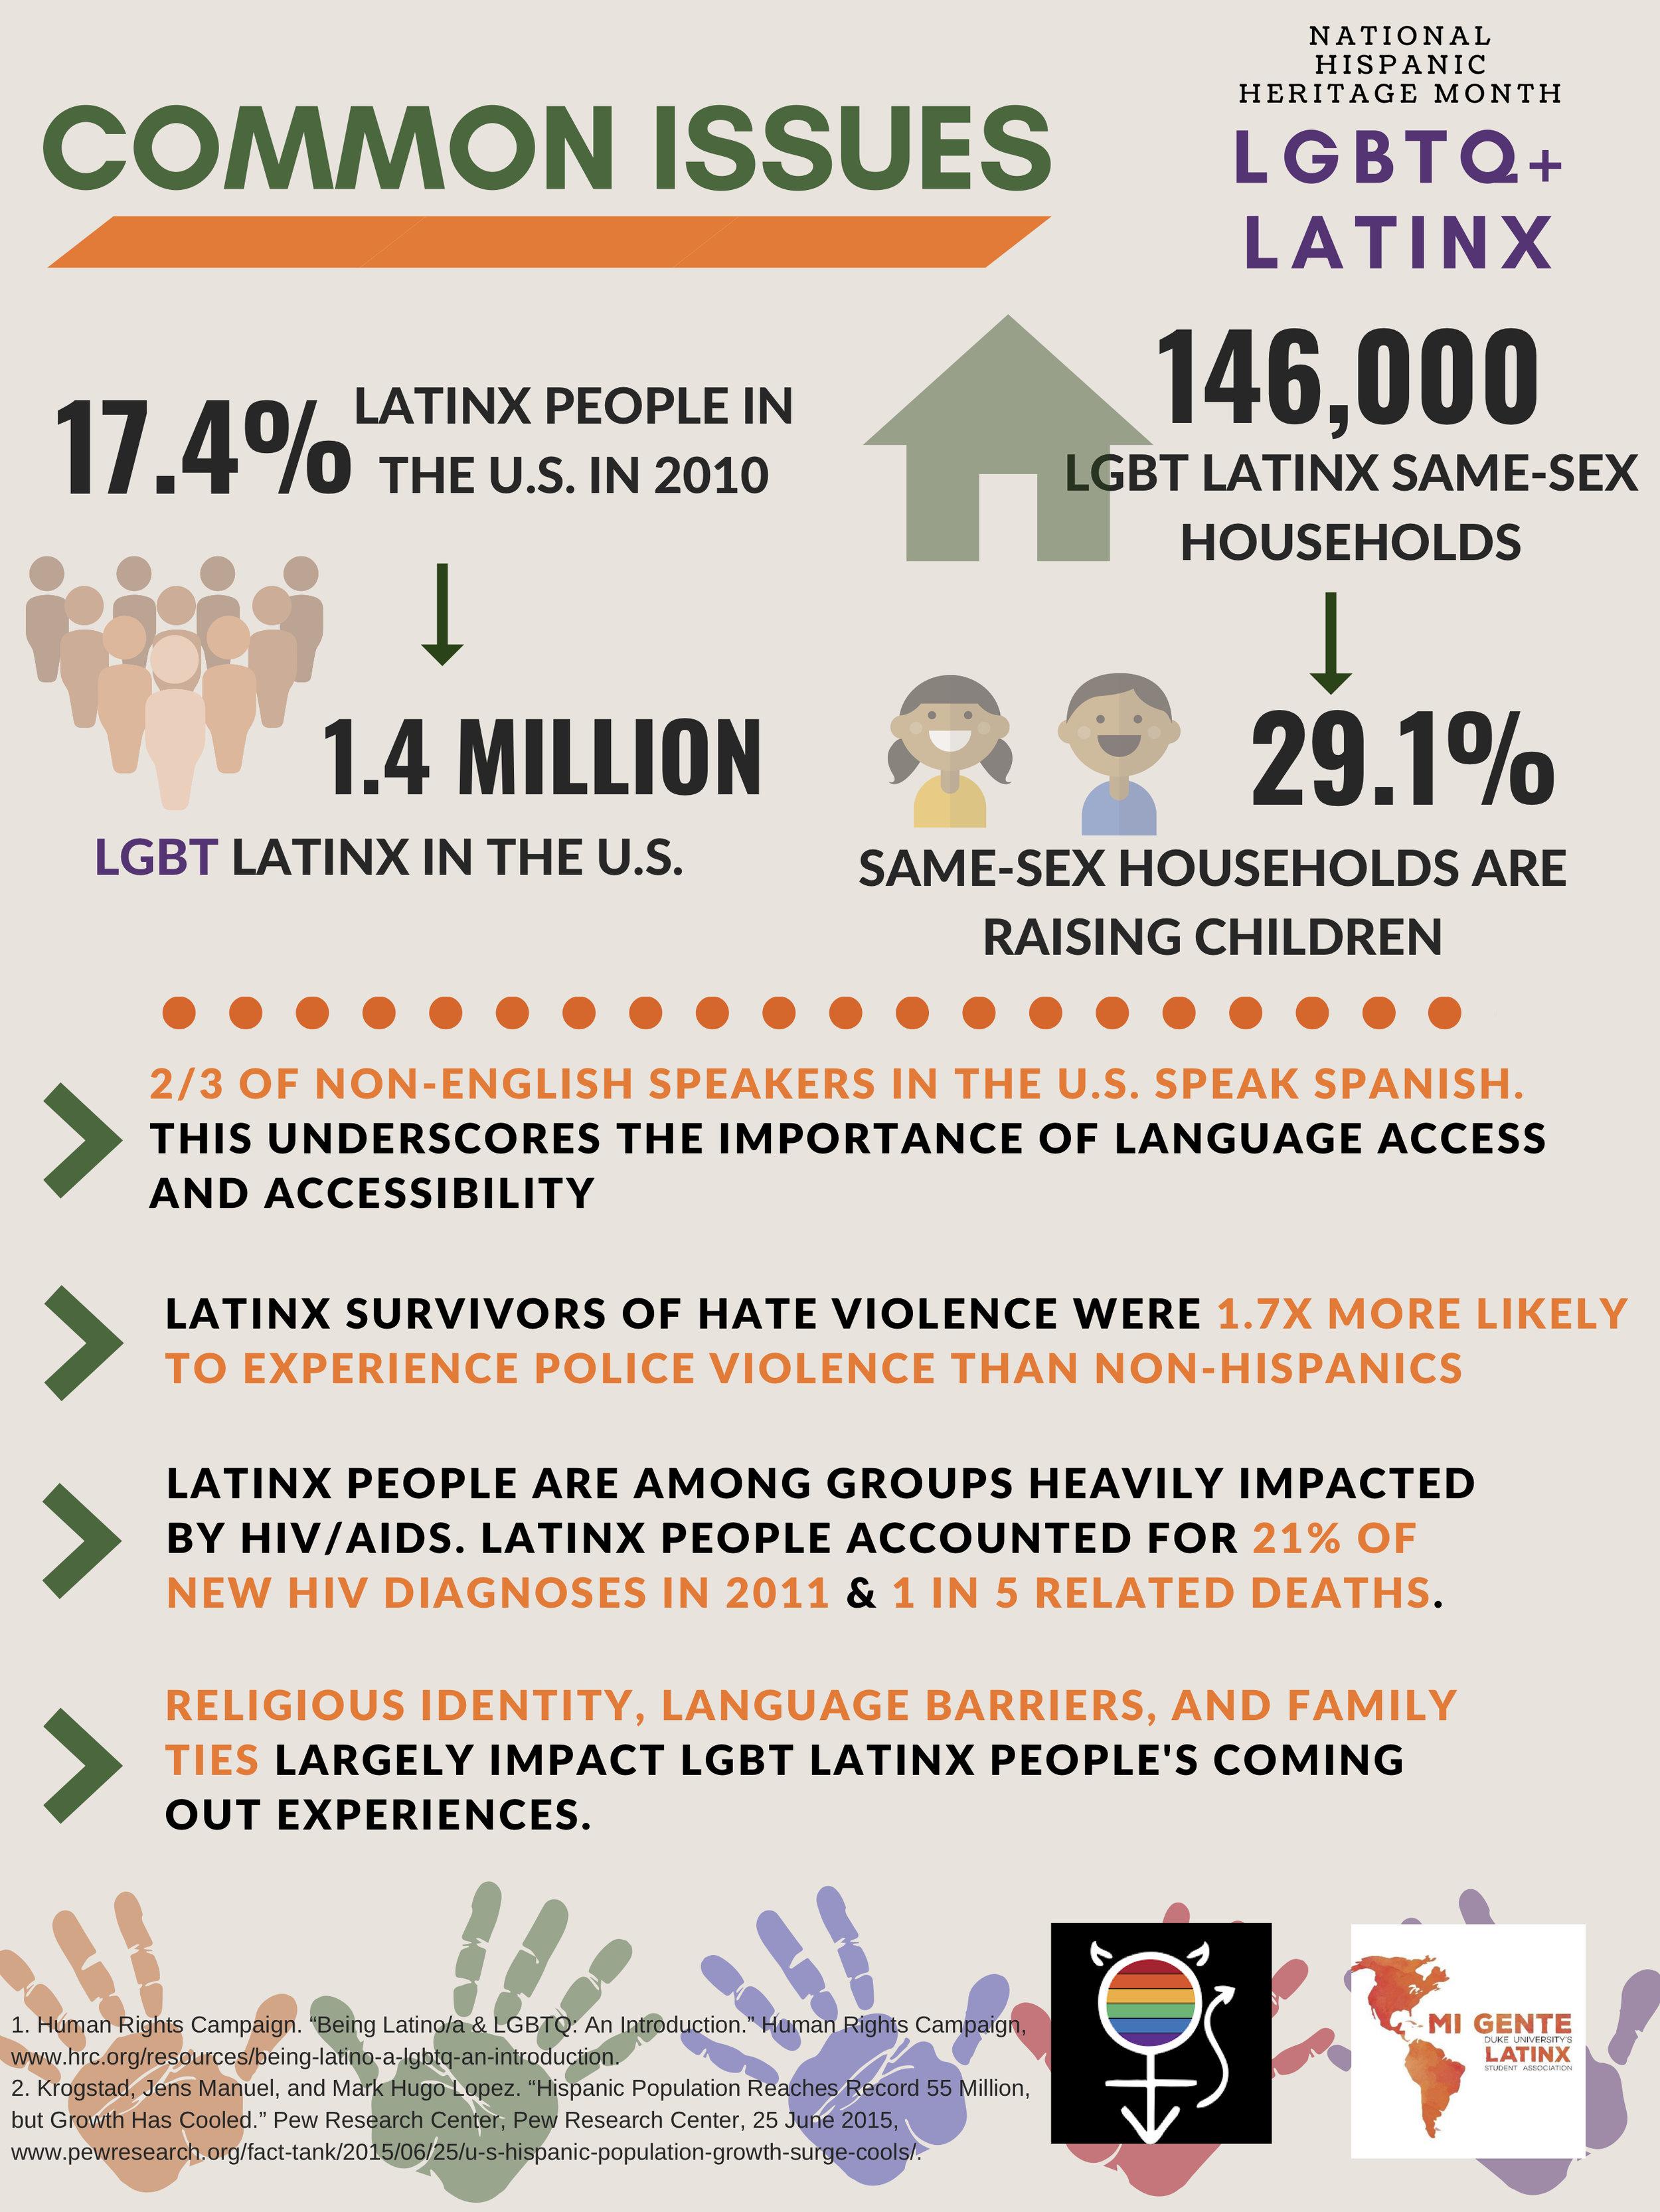 LATINO-LGBT-ISSUES.jpg